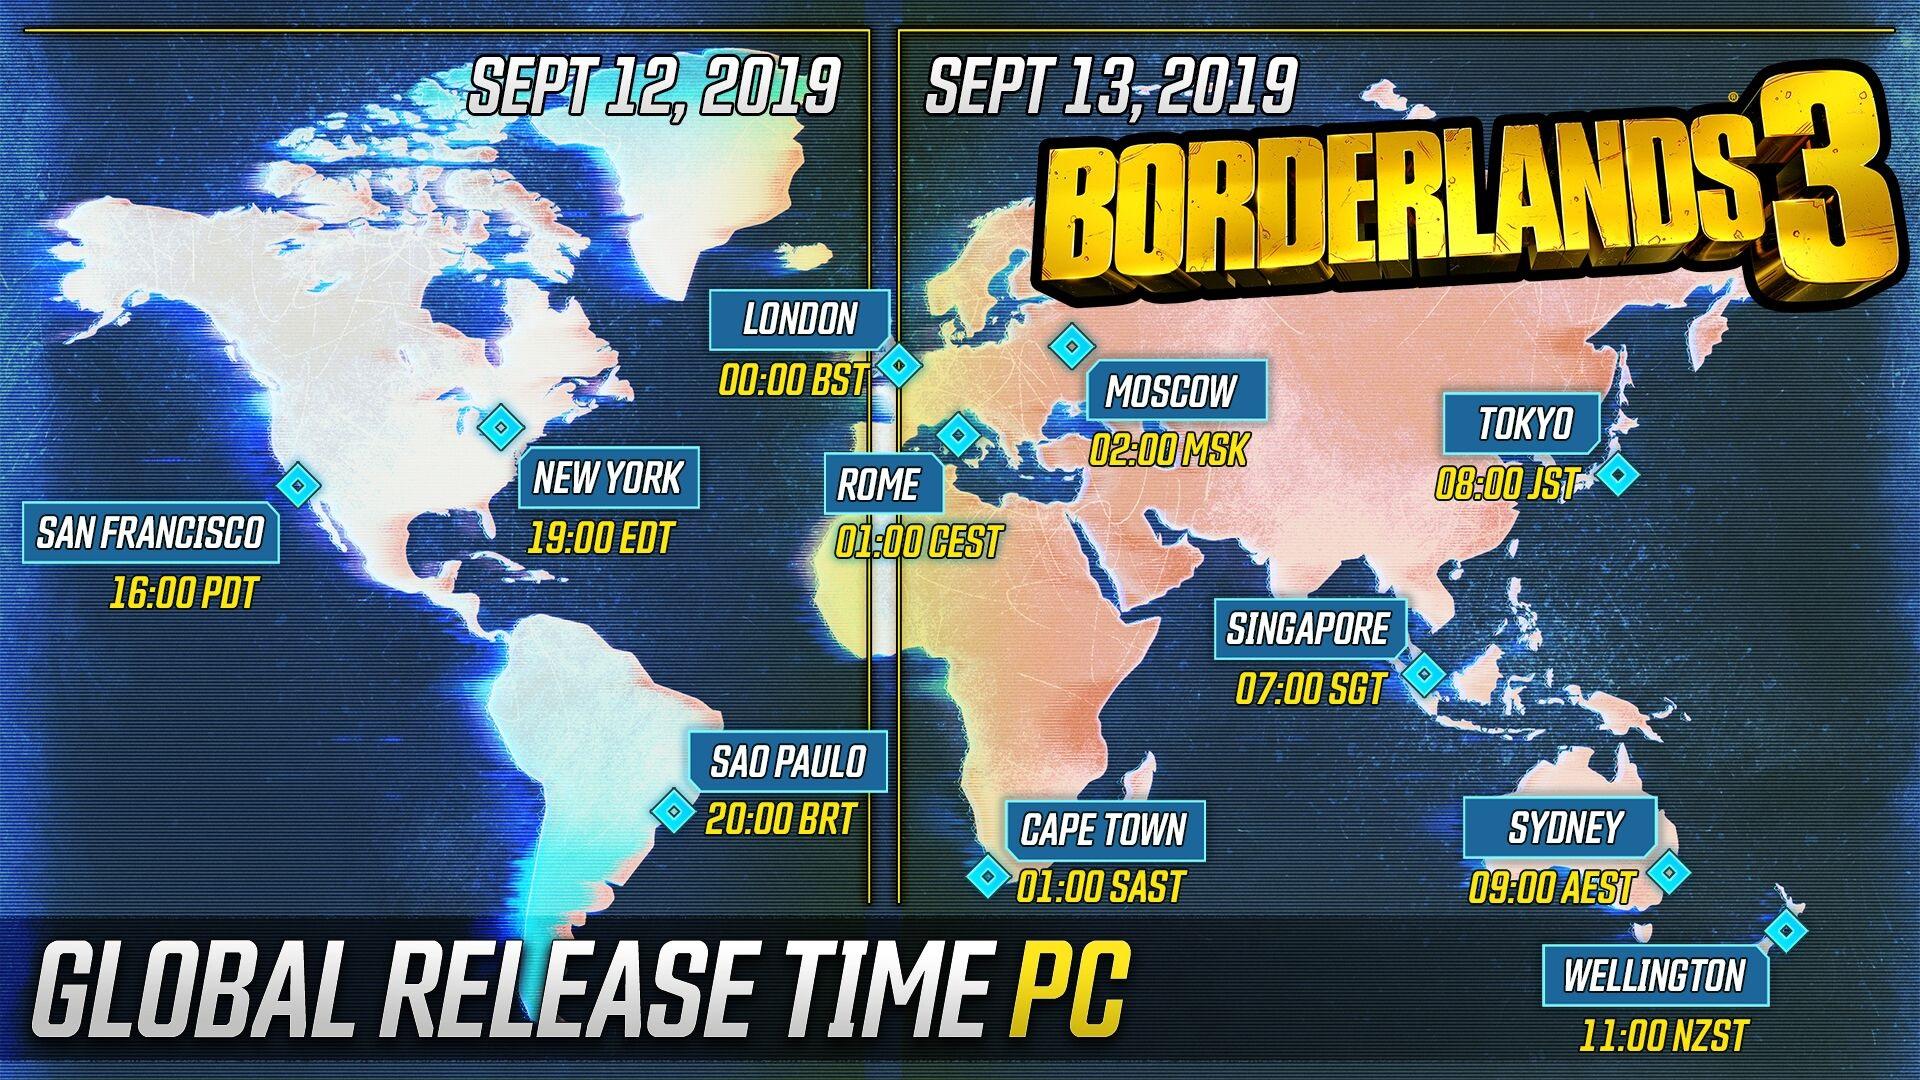 Borderlands 3 PC Release Times